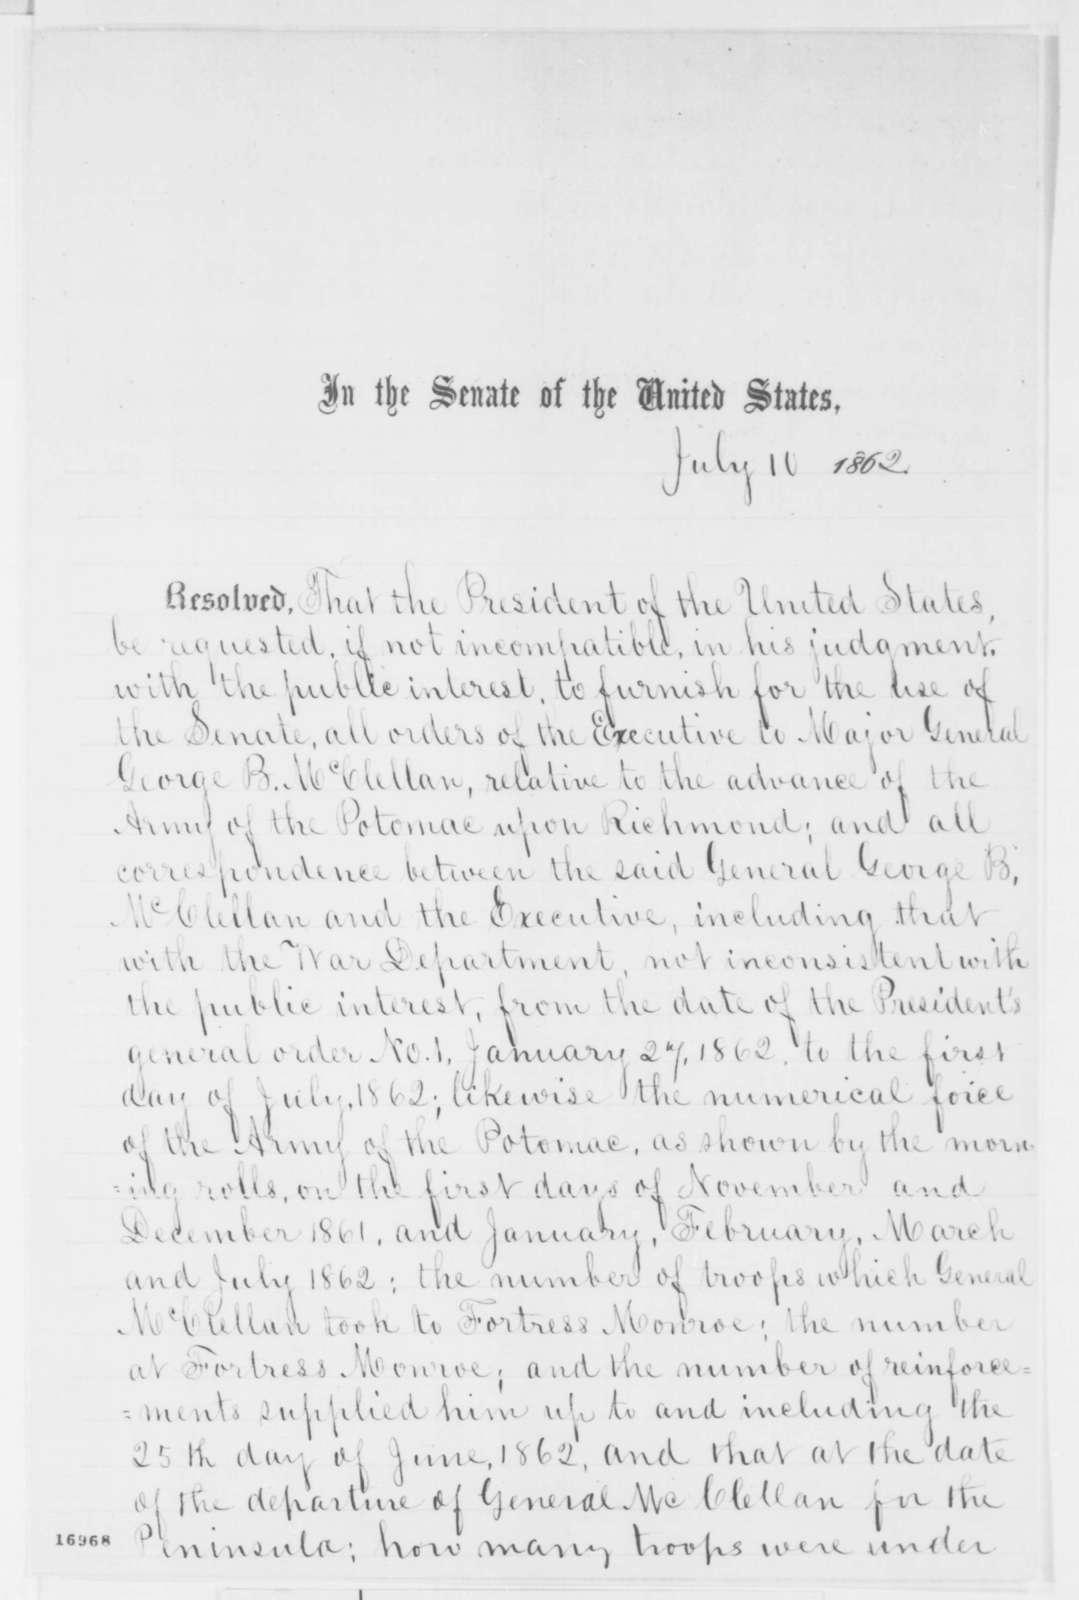 Senate, Thursday, July 10, 1862  (Resolution)